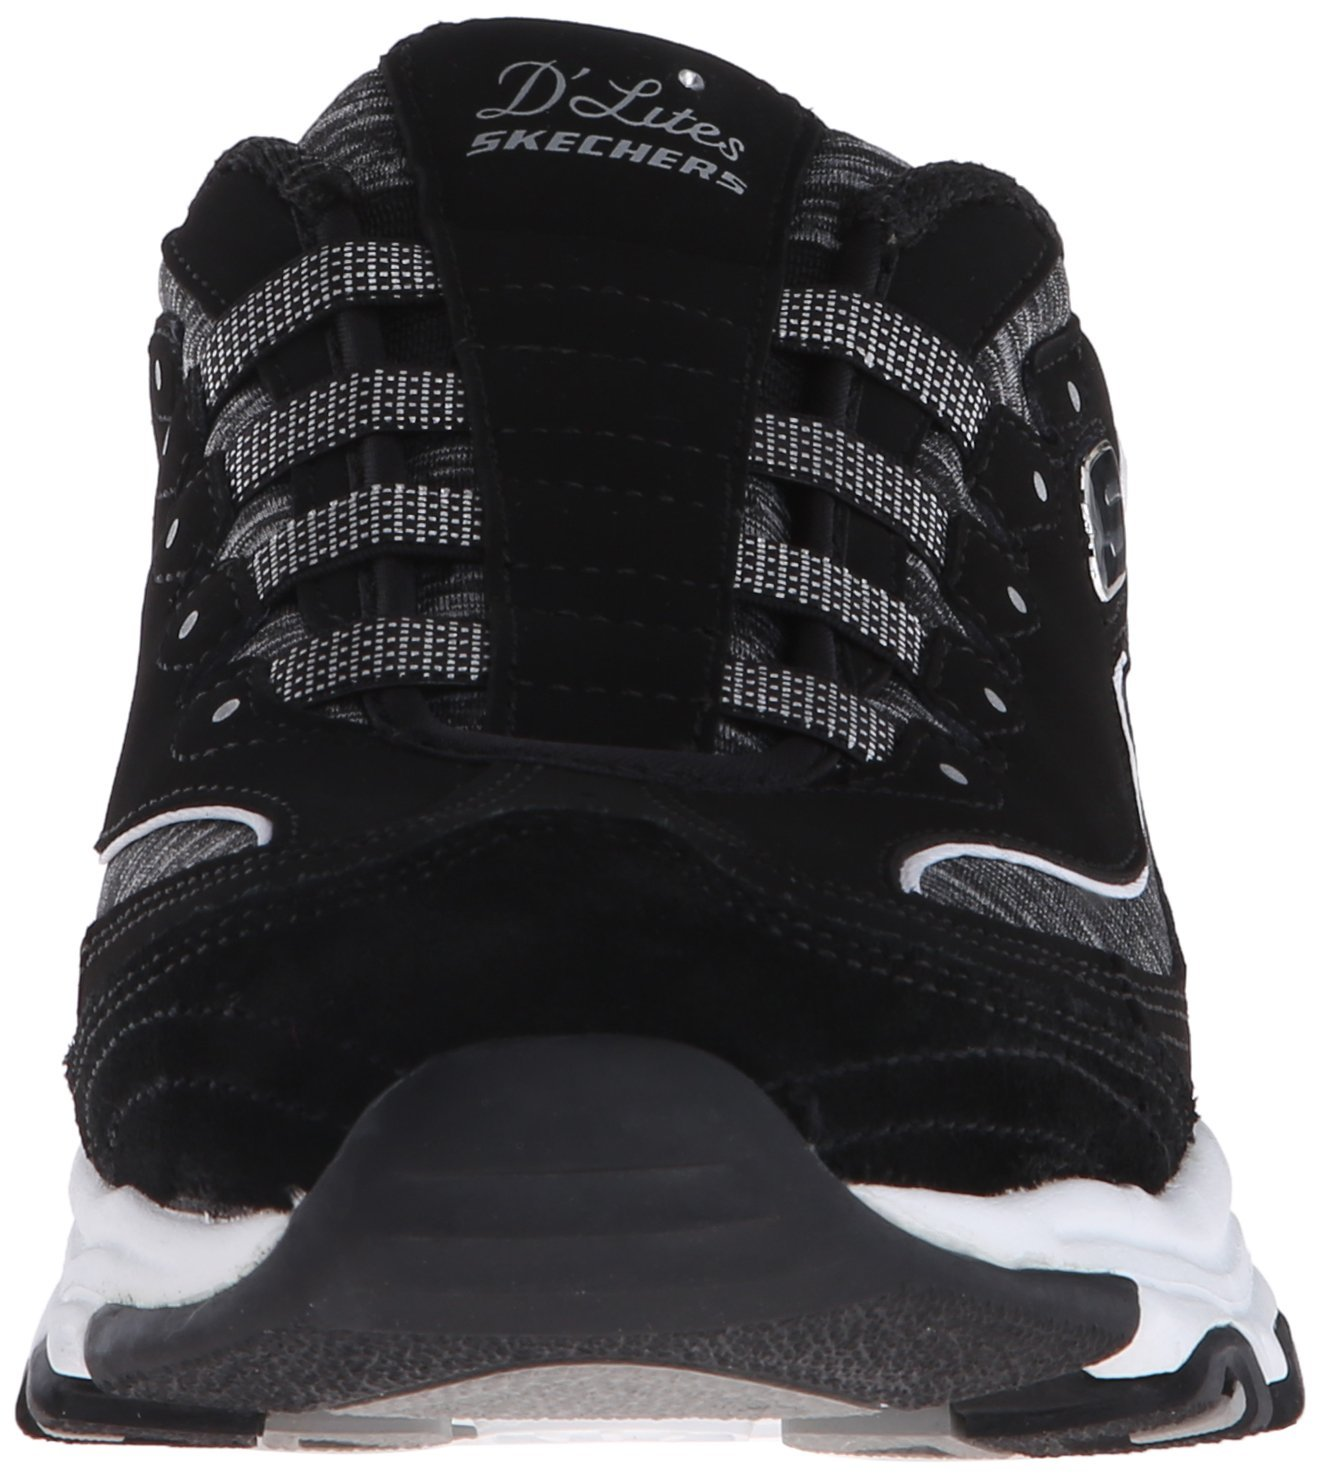 Skechers Sport Women's D'Lites Slip-On Mule Sneaker B019FV0SX8 9 B(M) US Black/White